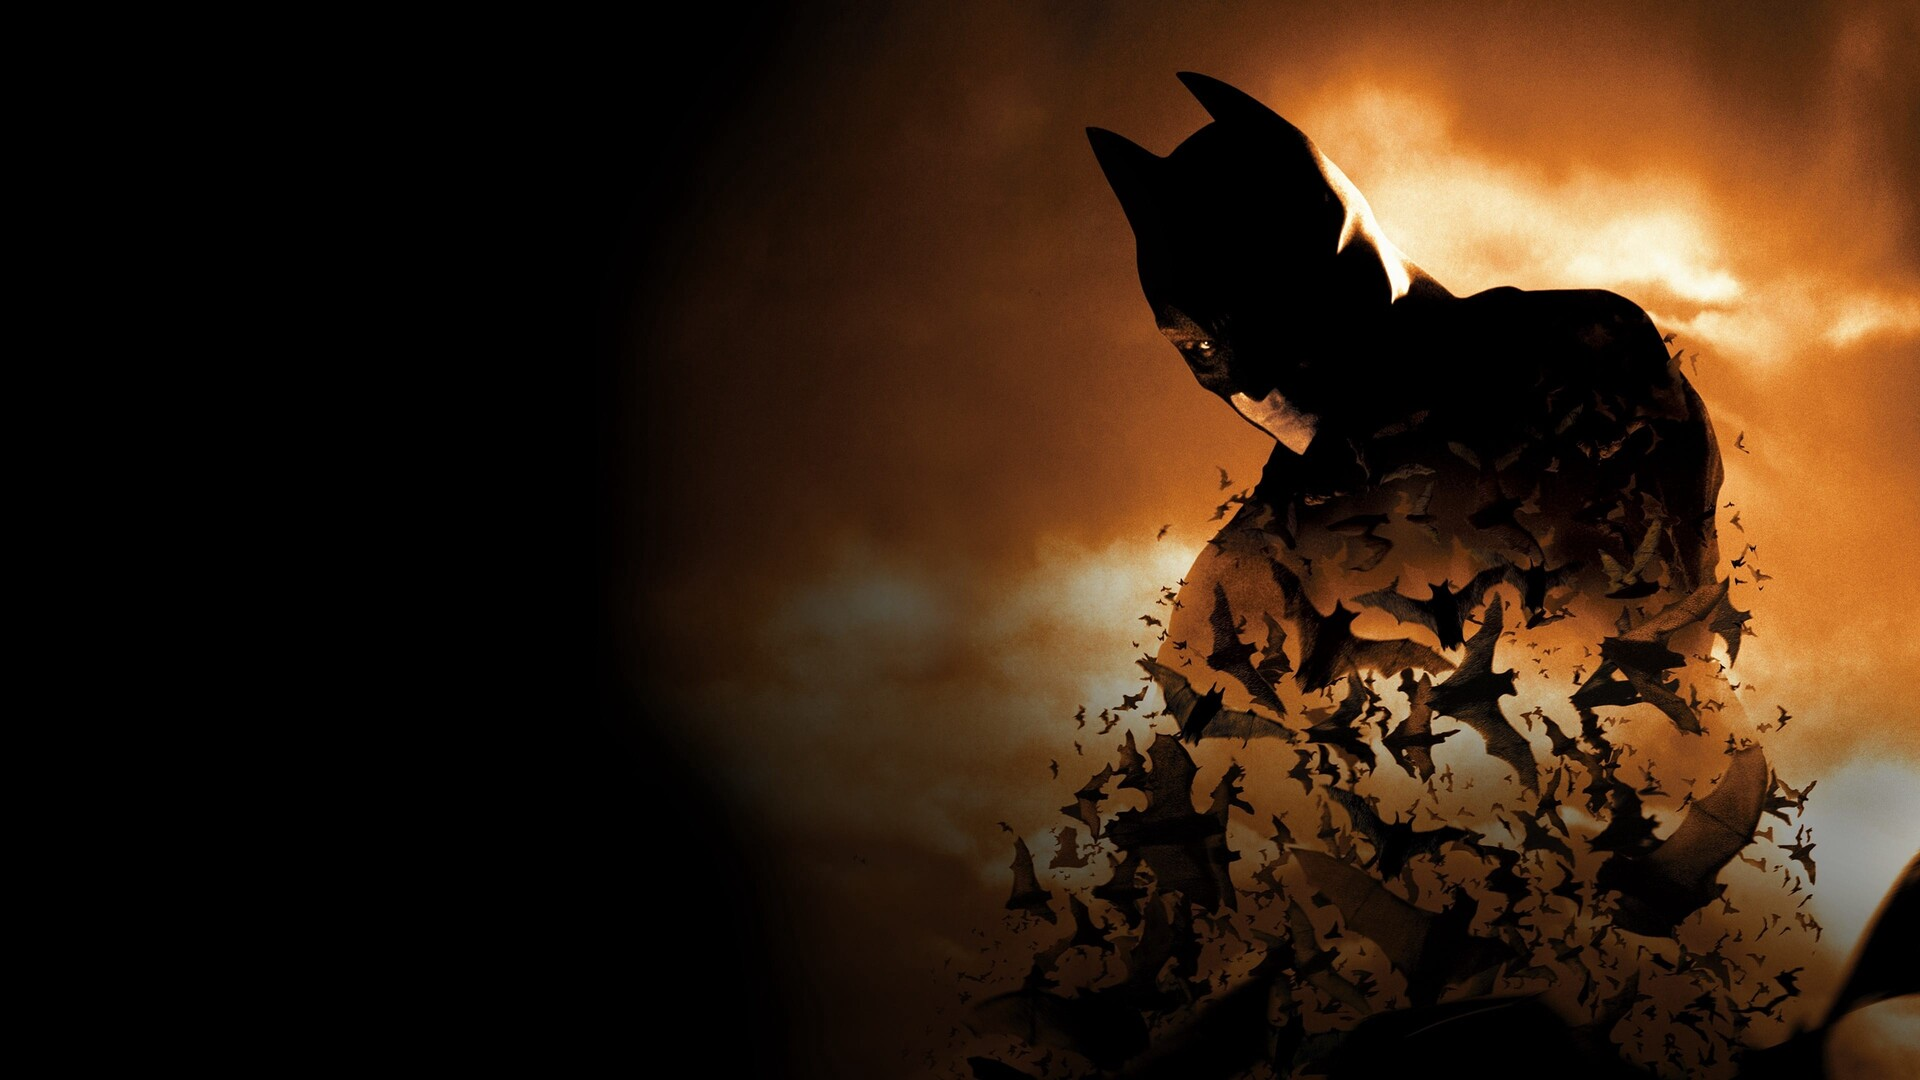 Spoiled Rotten 119: Revisiting Batman Begins